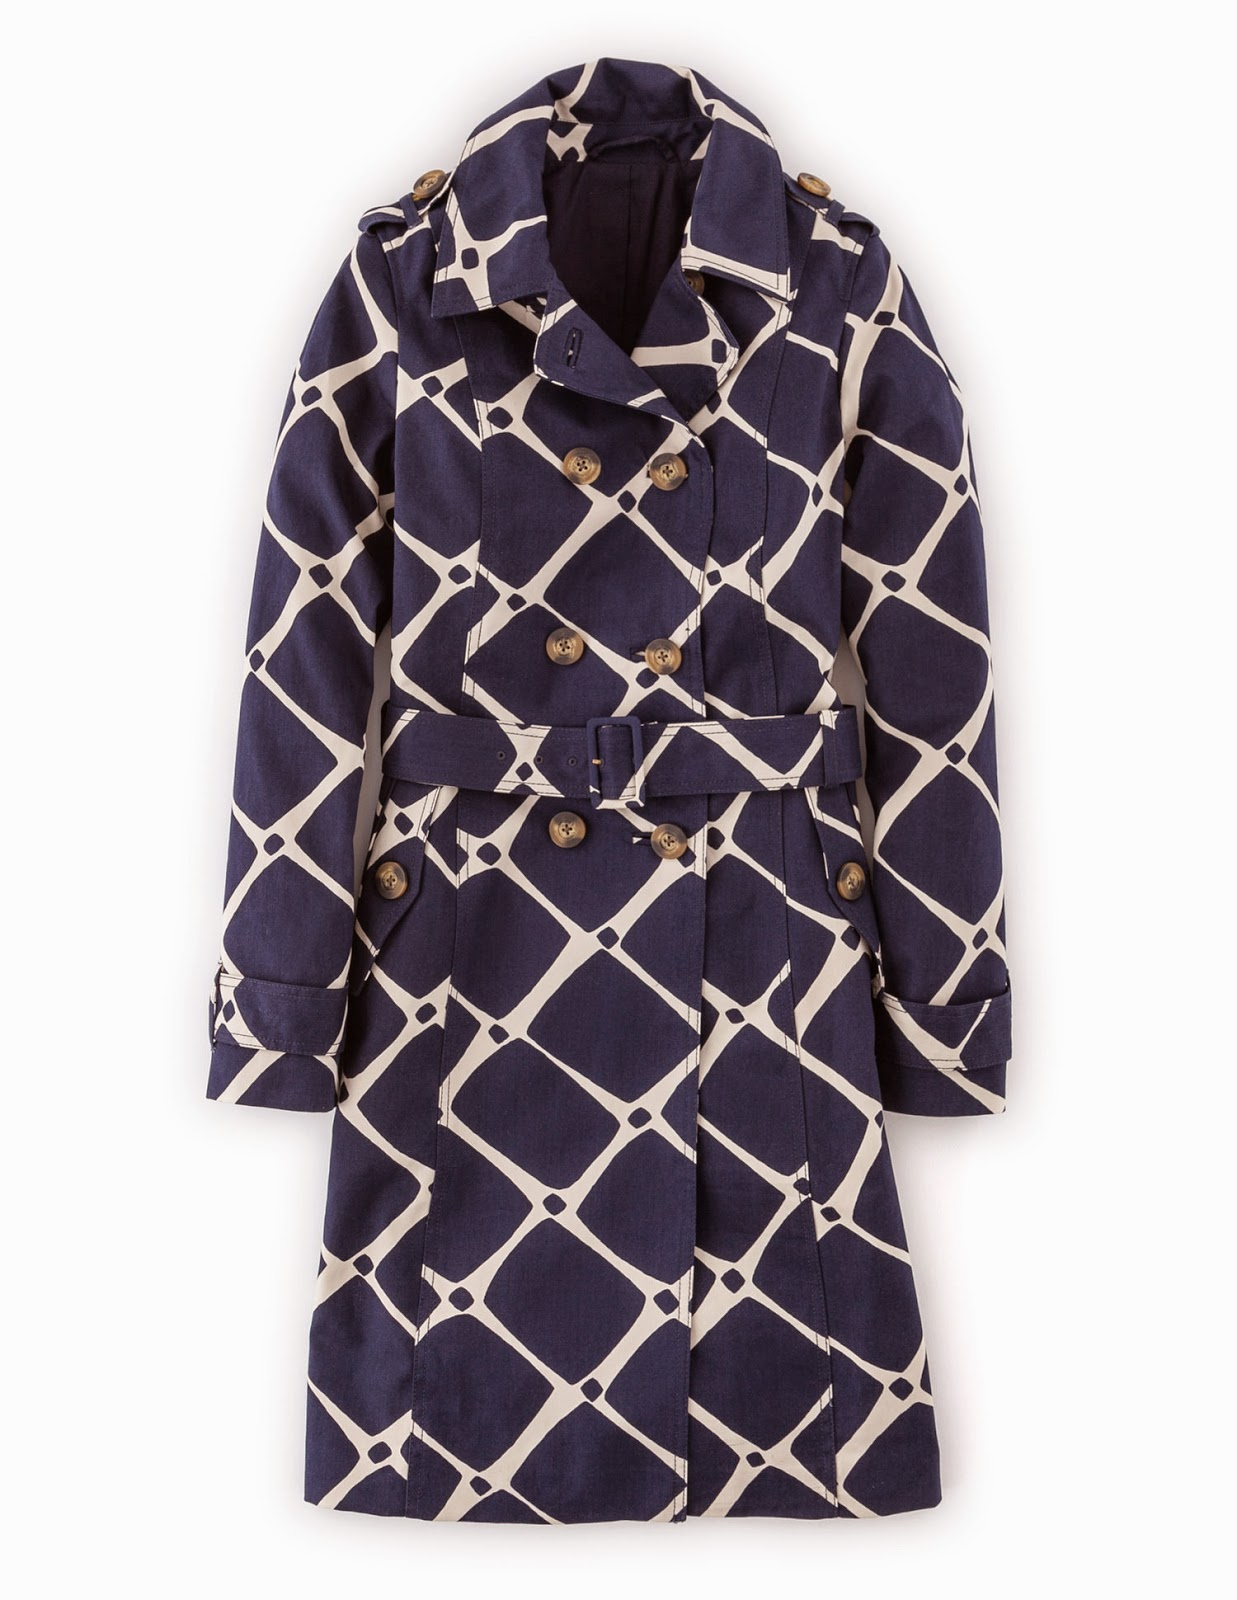 http://www.boden.co.uk/en-GB/Womens-Coats-Jackets/Coats/WE451-NAV/Womens-Navy-Print-Autumn-Trench.html